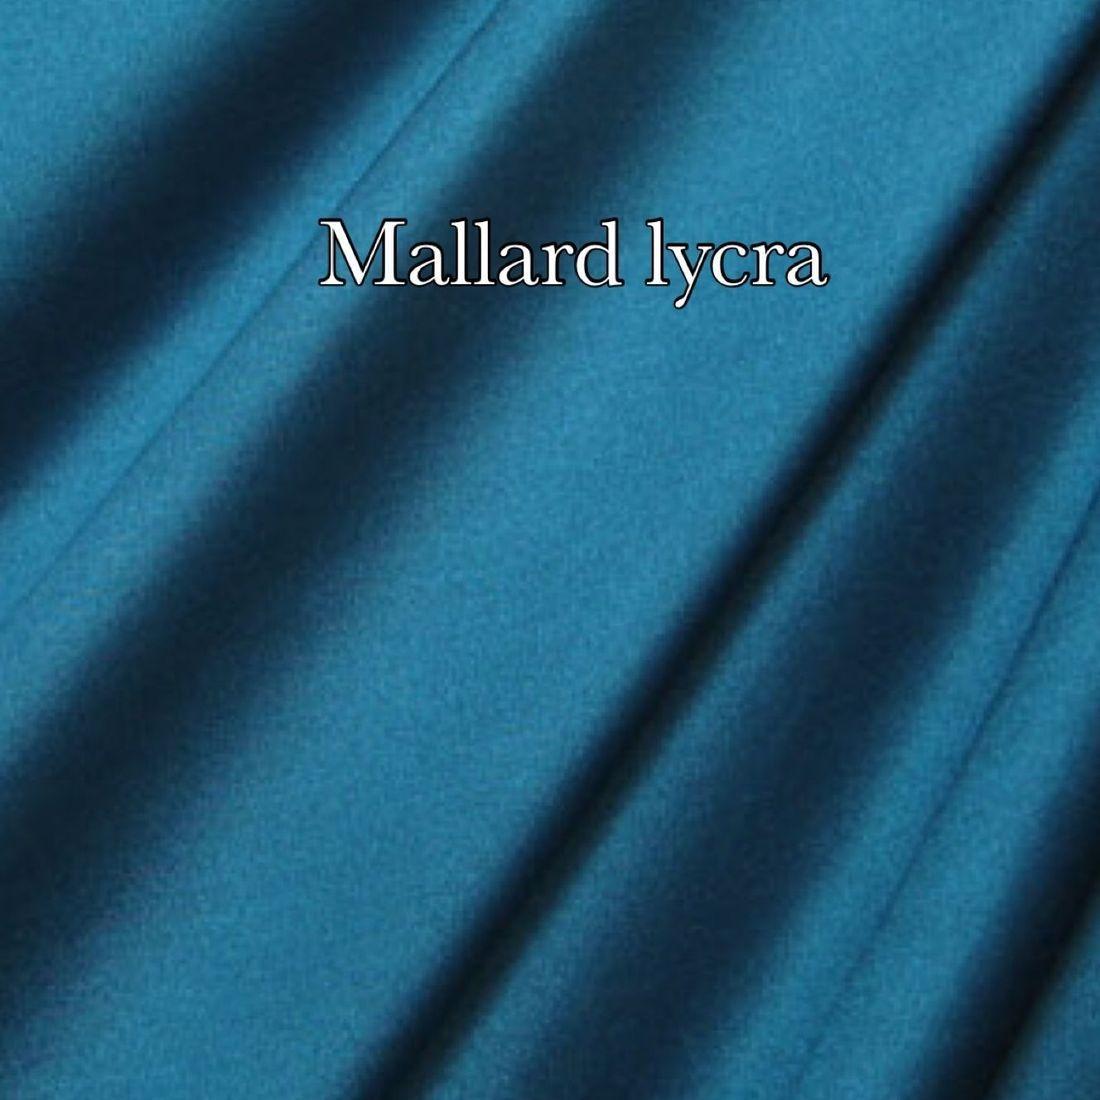 Mallard lycra